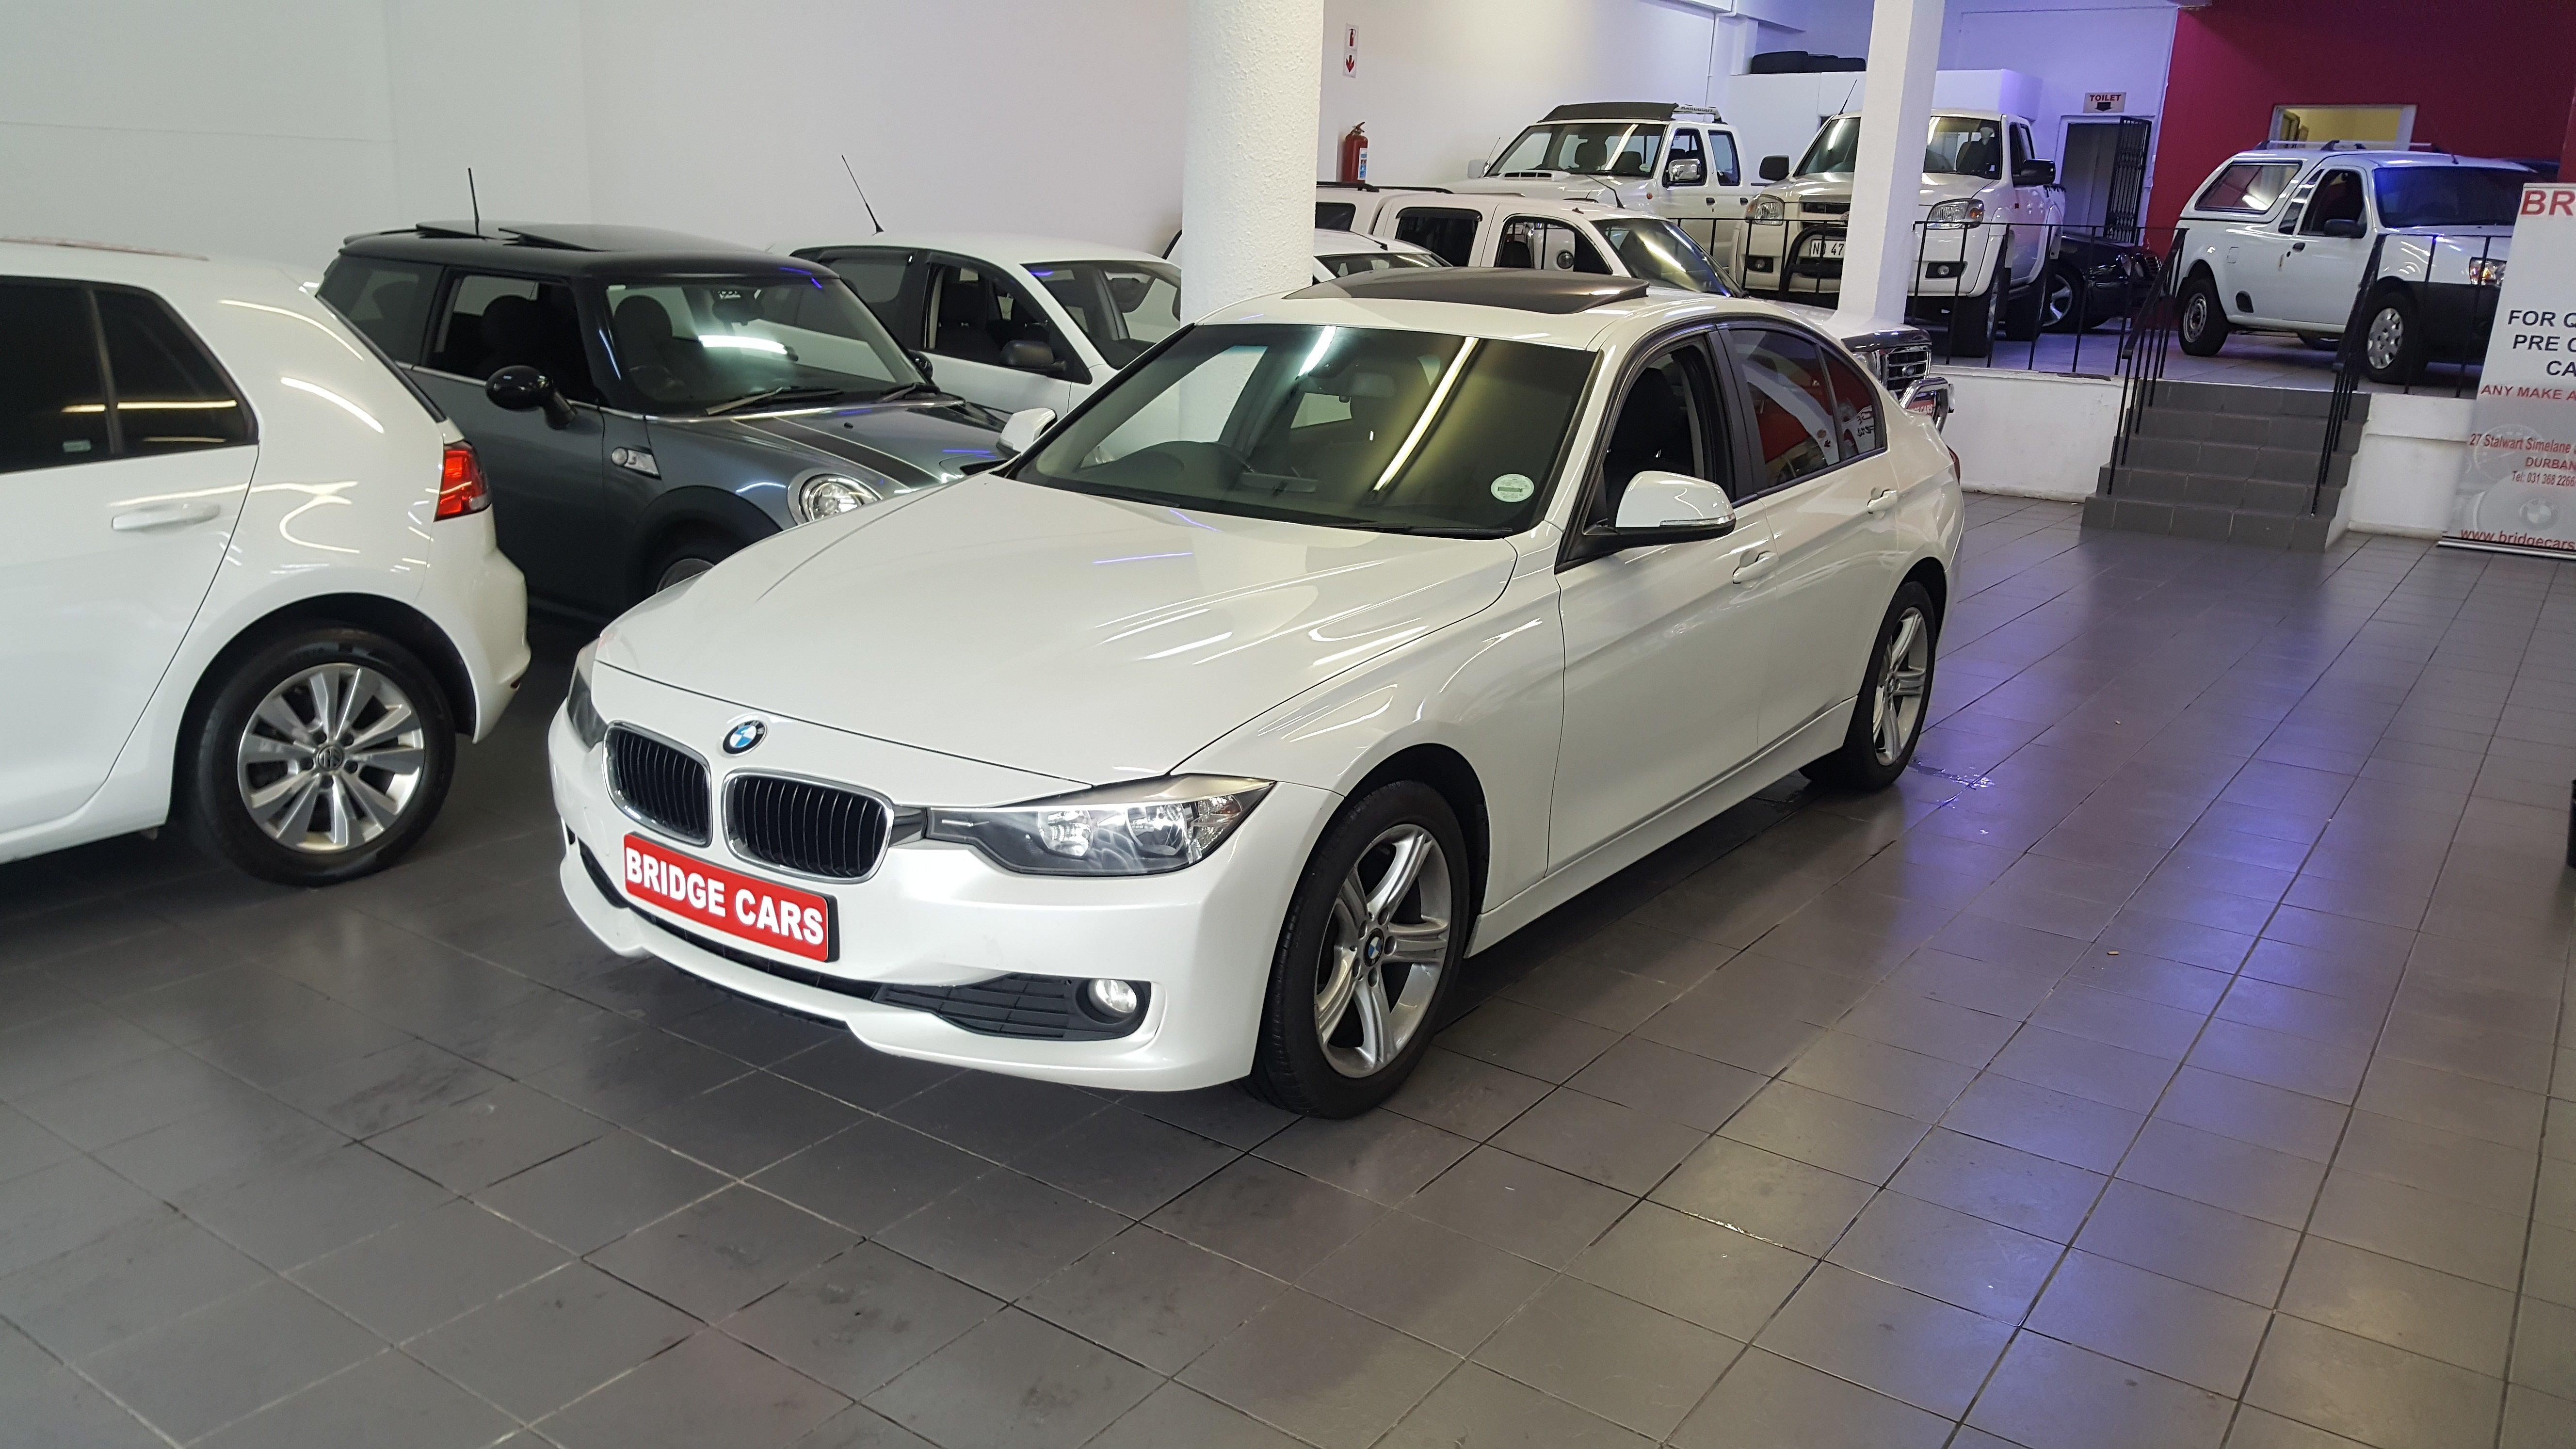 For Sale Bmw 320d F30 2012 Sedan Used Price R209990 Kwazulu